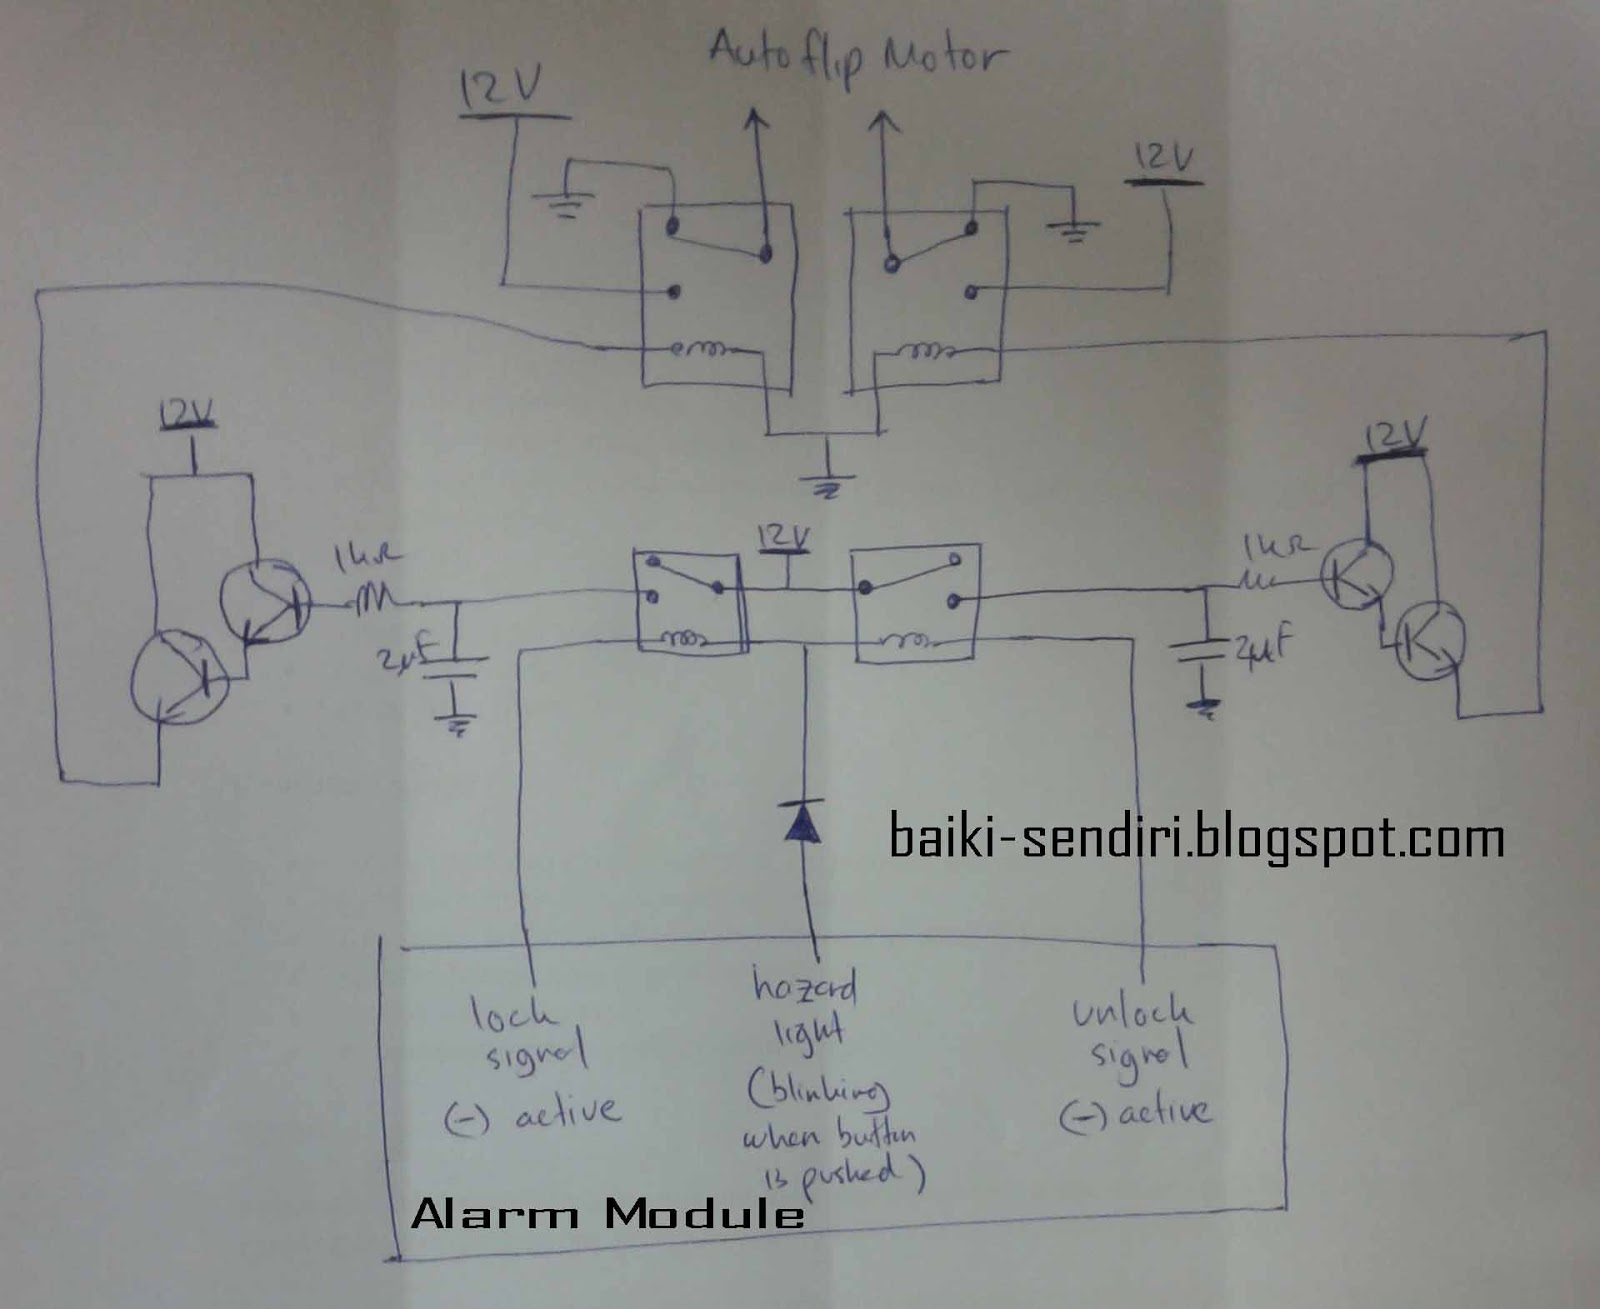 Fine Chapman Alarm Wiring Diagram Motif - Electrical Circuit Diagram . & Awesome Porsche 944 Alarm Wiring Diagram Festooning - Electrical and ...